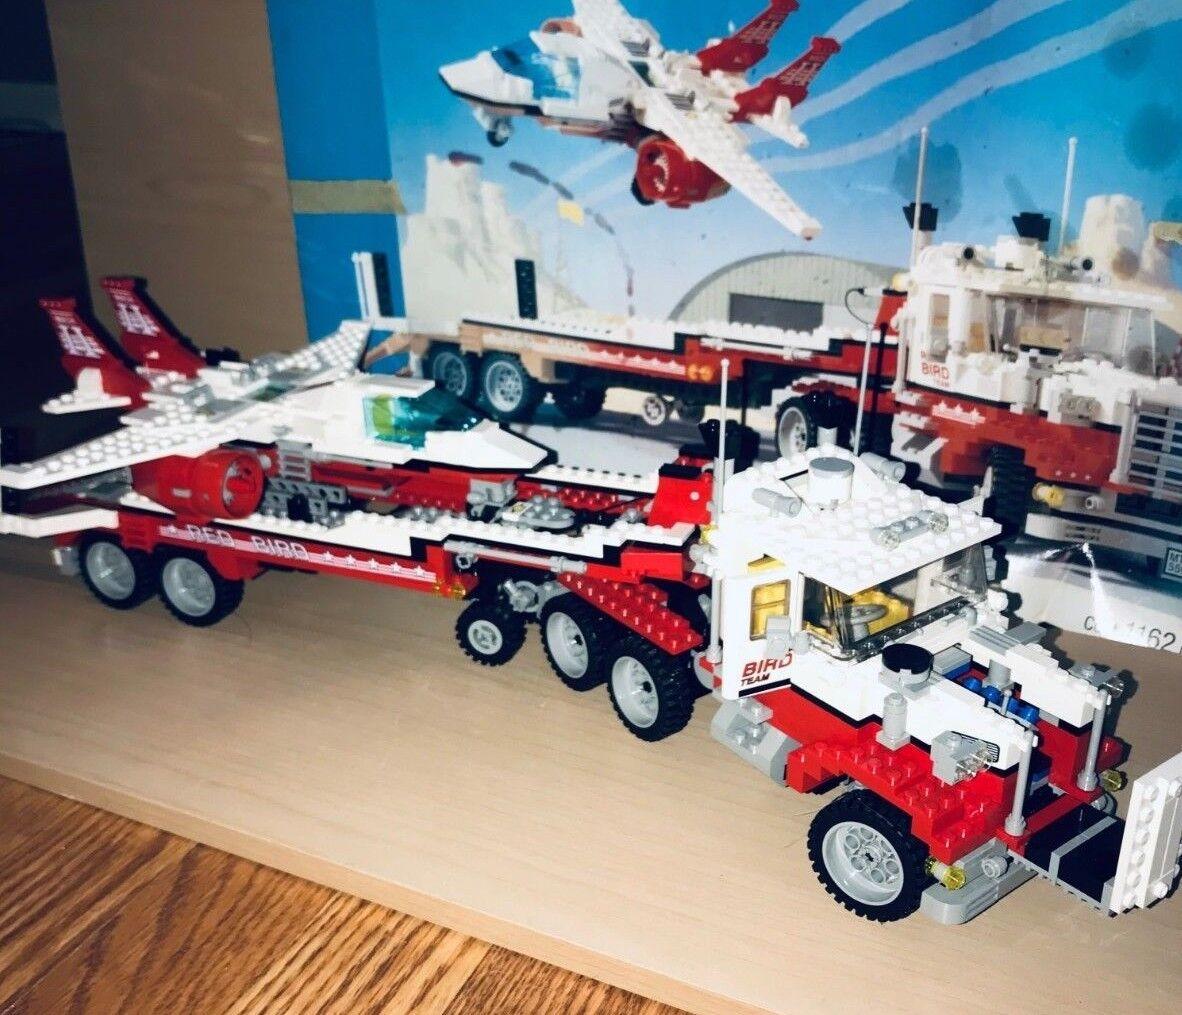 Lego 5591 Mach II Red Bird Rig Model Team Rare 1994 100% Complete